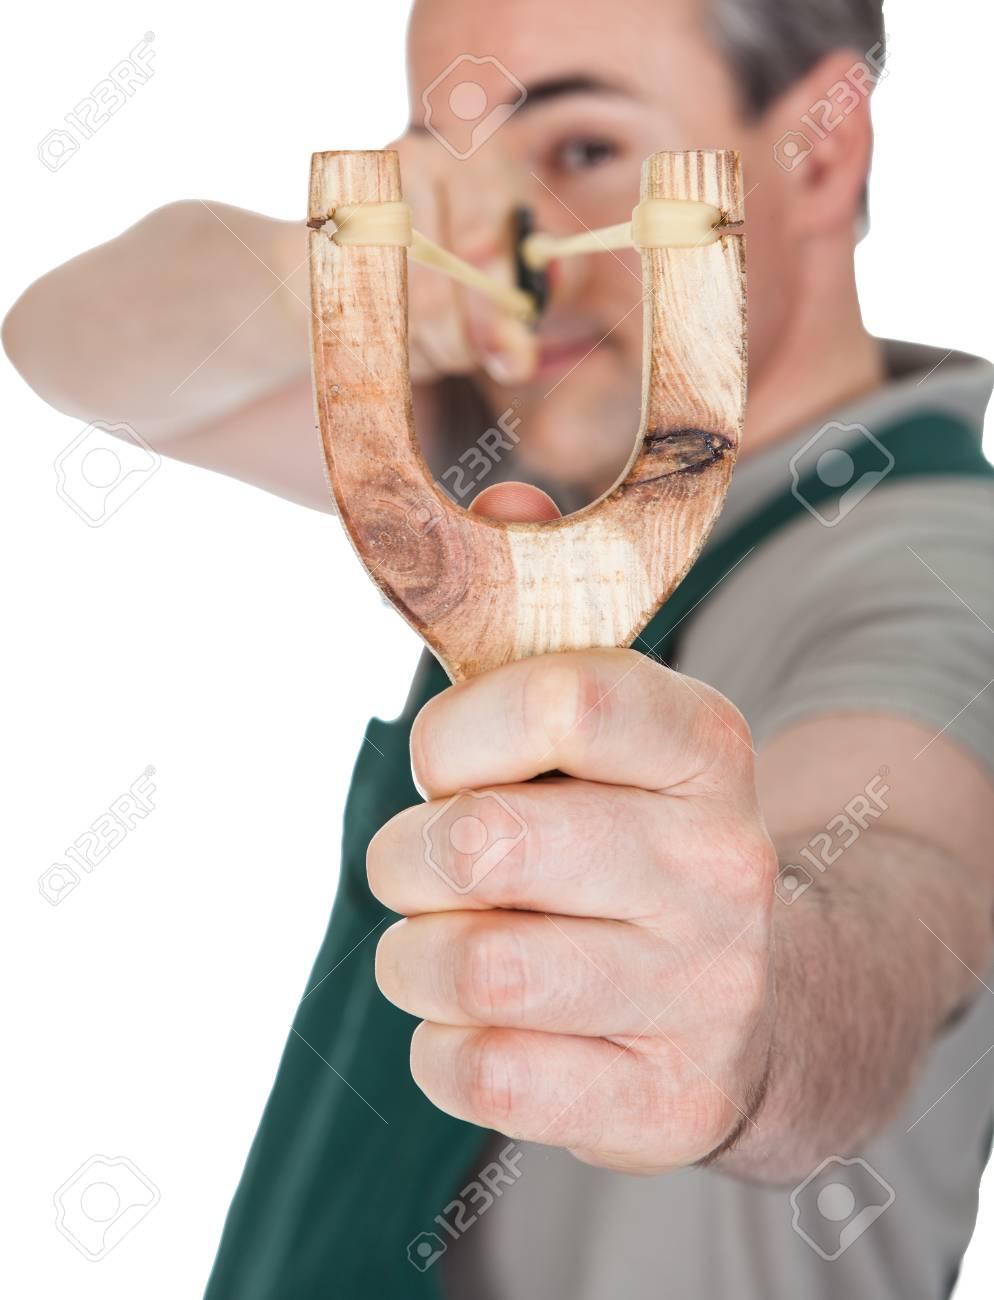 Close-up of hand pulling sling shot on white background Stock Photo - 21669443